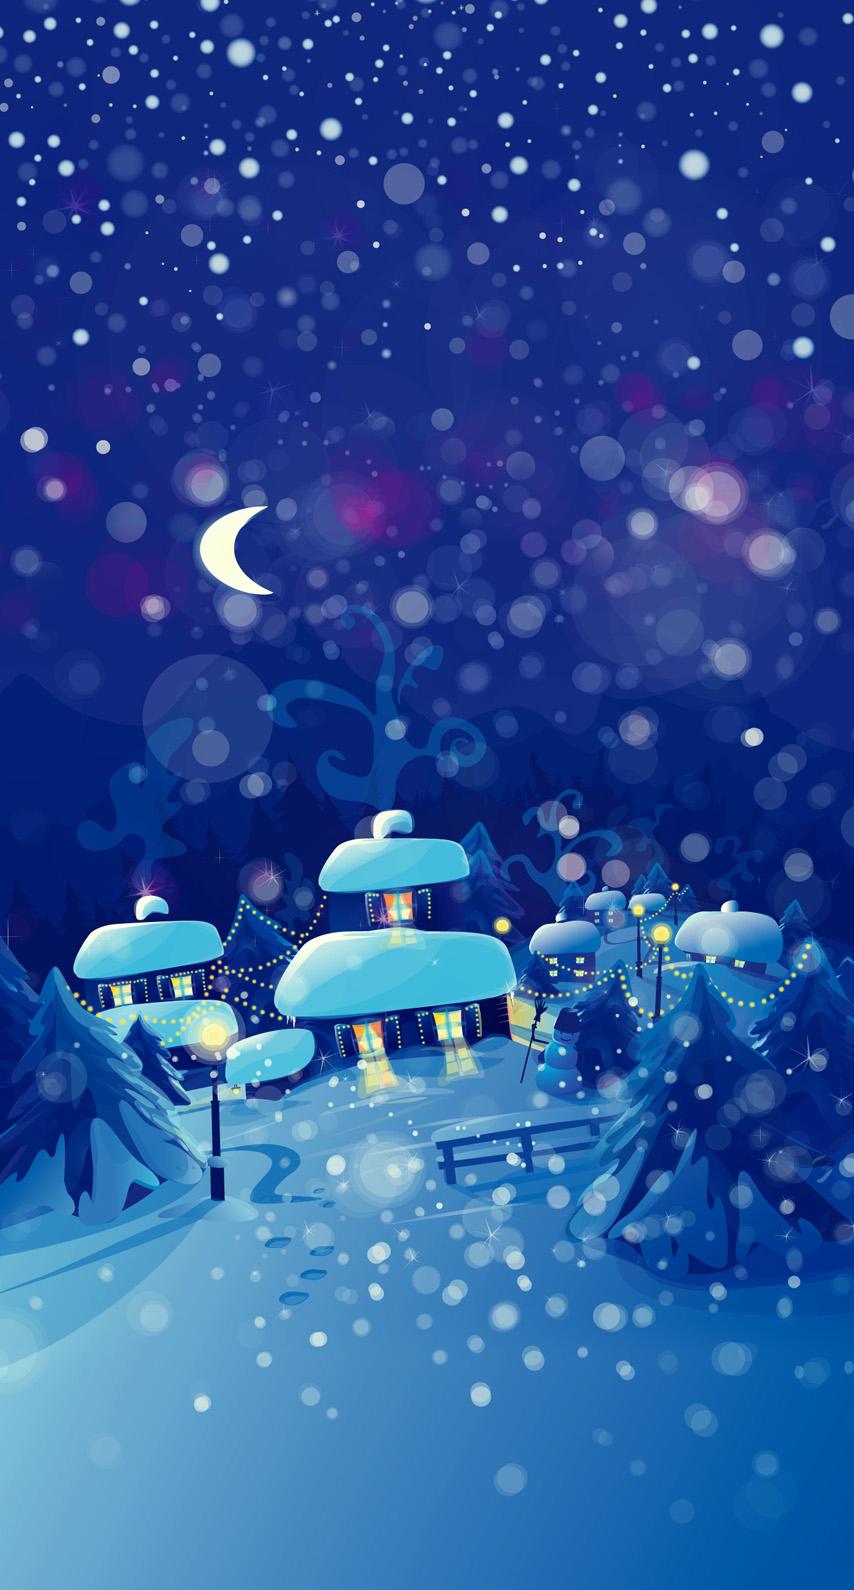 fir, christmas decoration